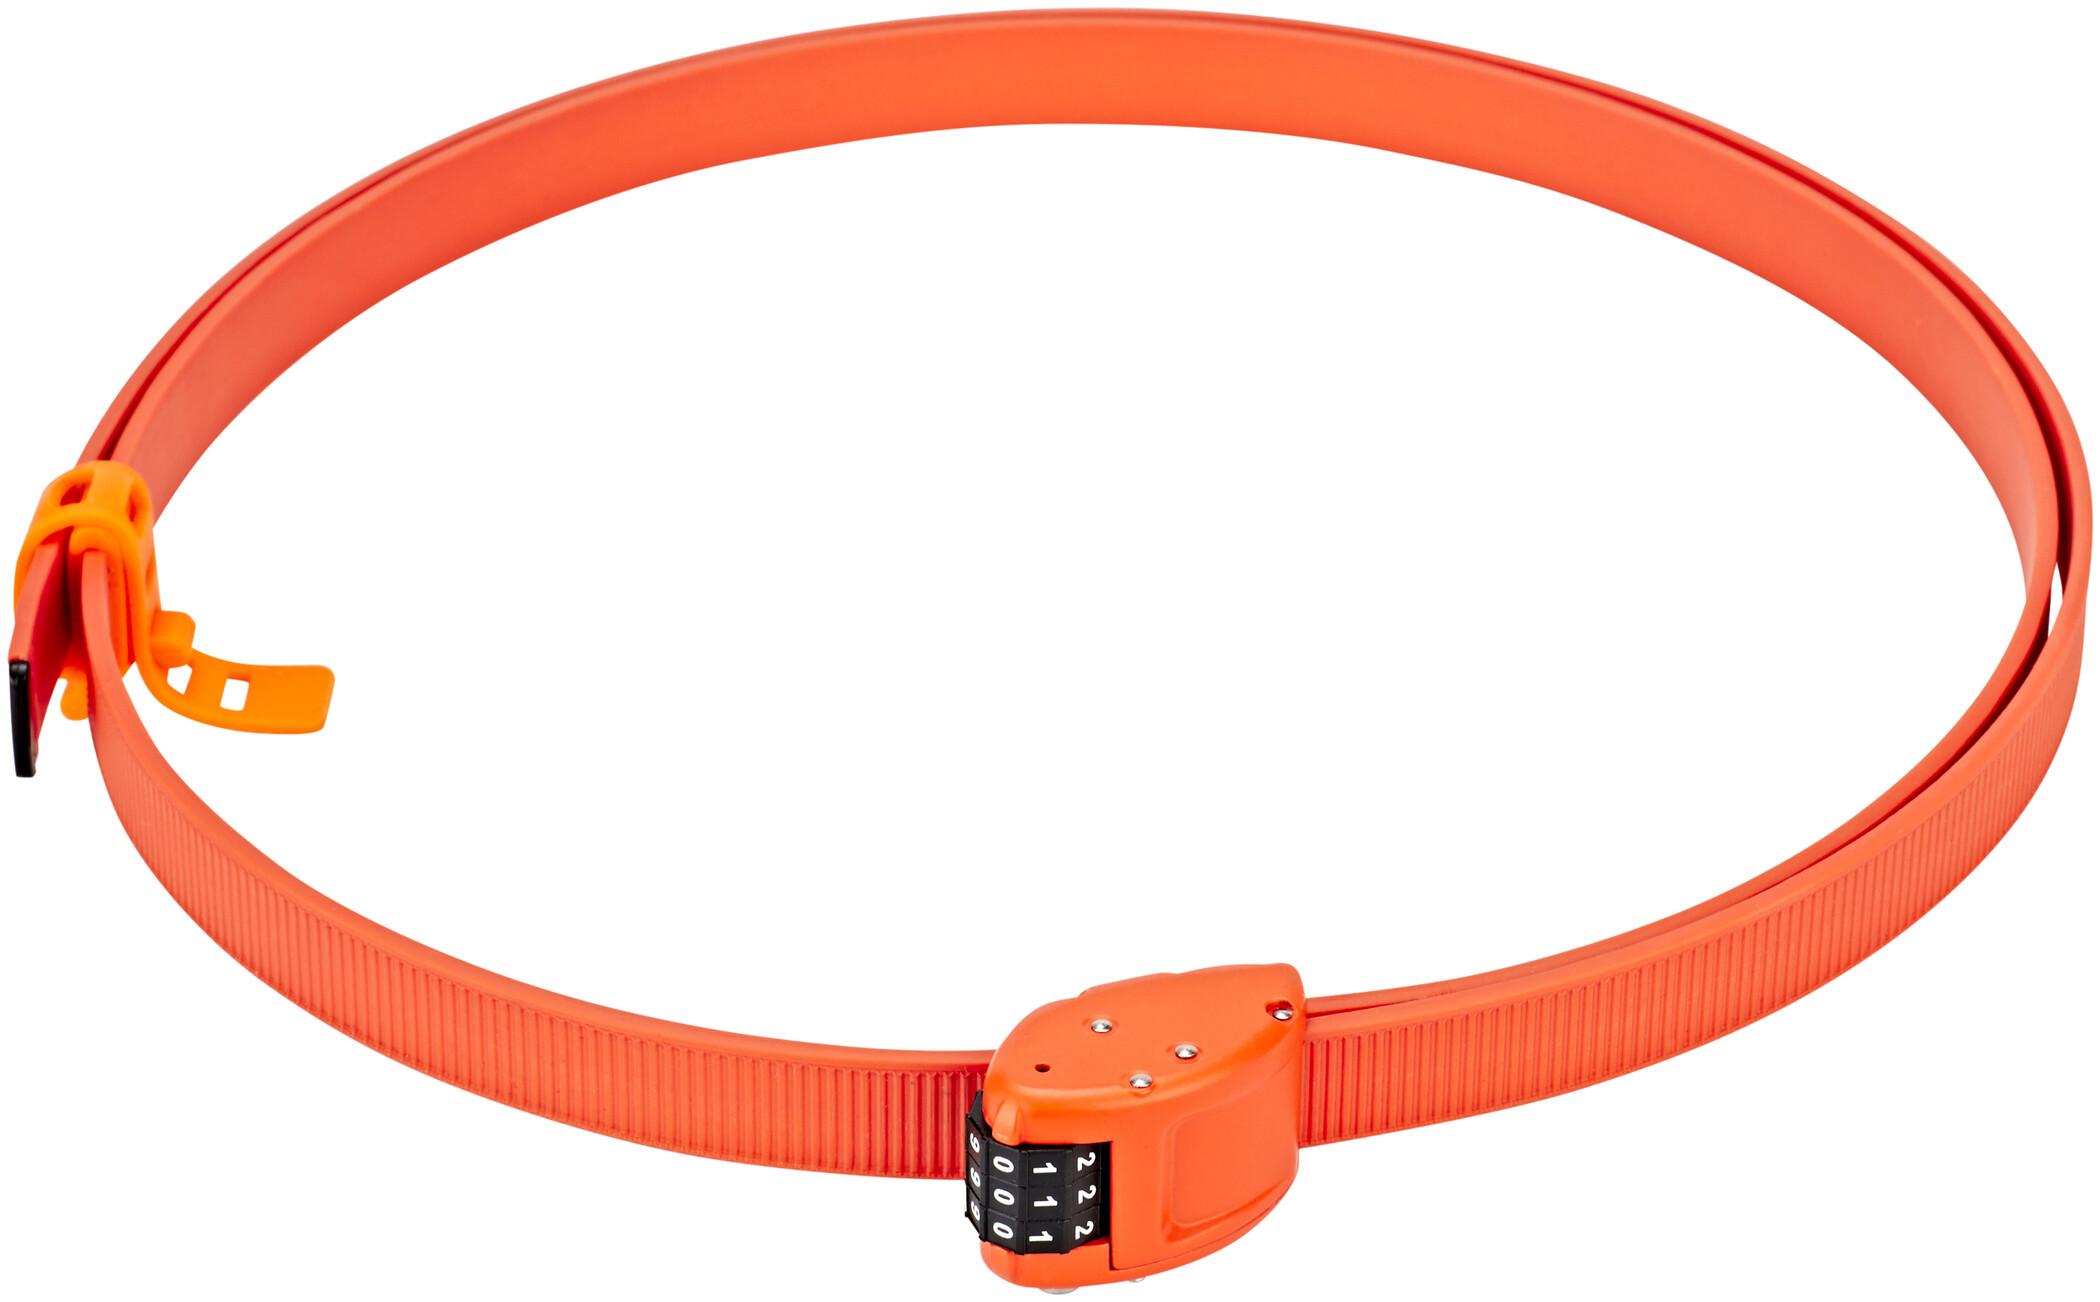 OTTOLOCK Cinch Lock 150 cm, otto orange | Løse låse